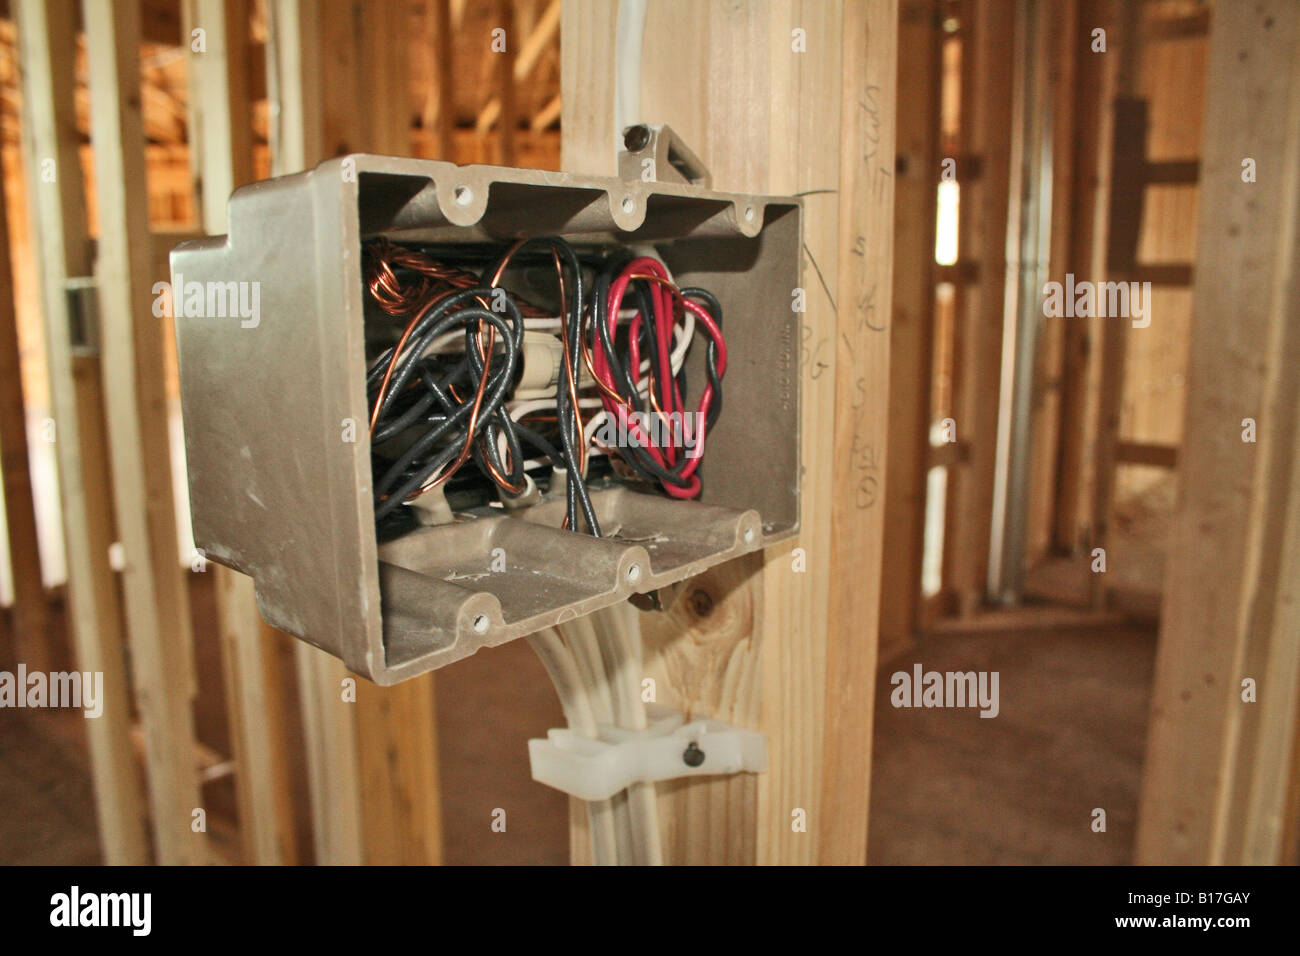 Verkabelung Steckdose im Haus Neubau Stockfoto, Bild: 17991539 - Alamy